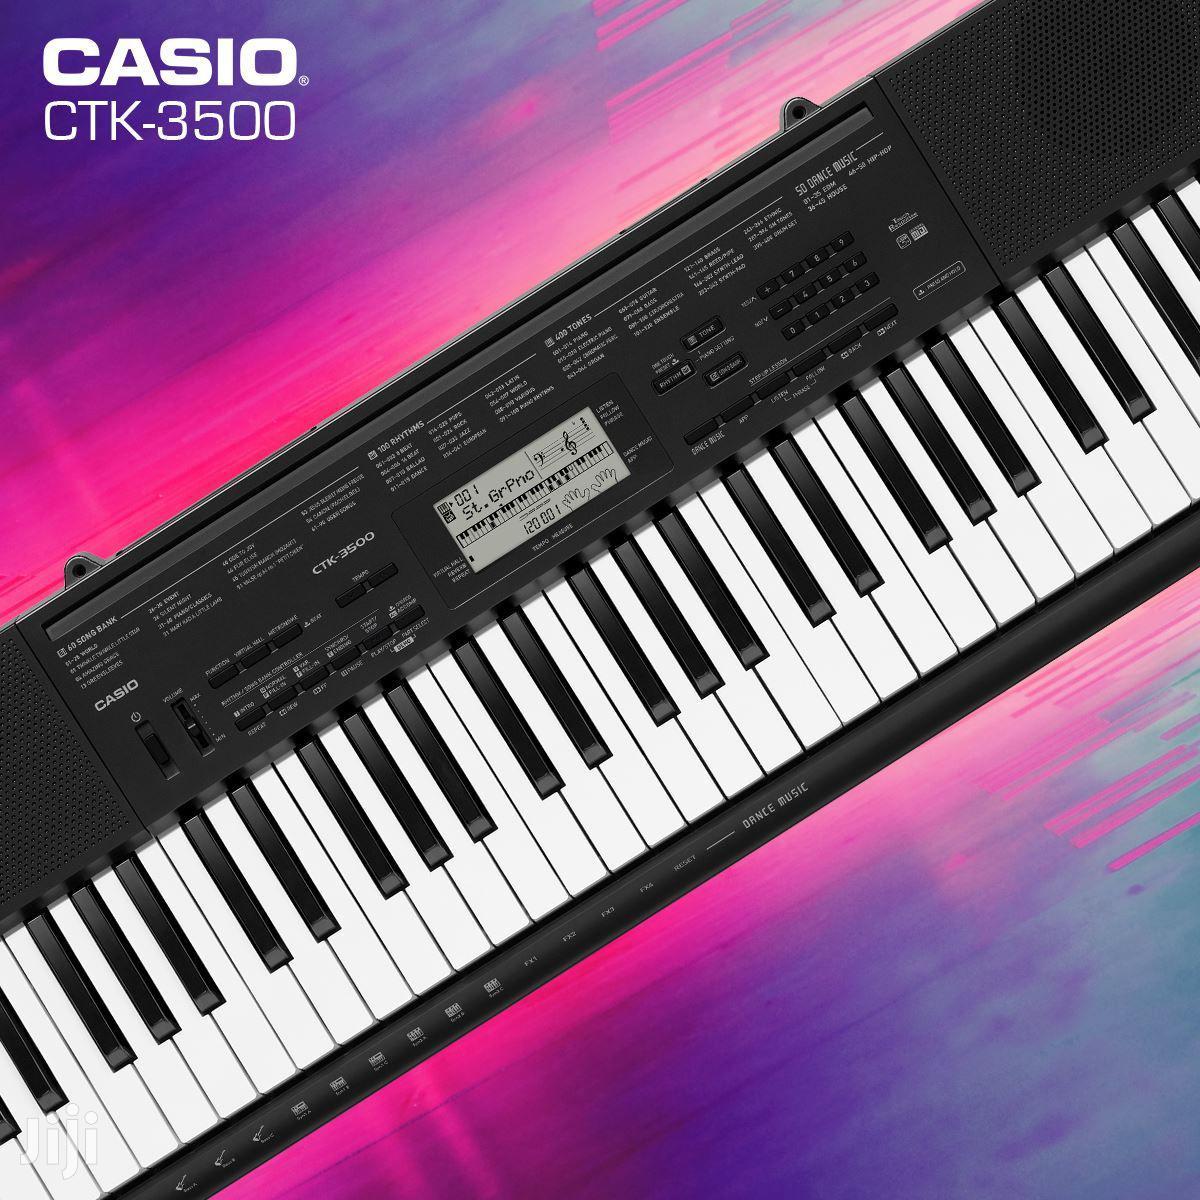 Casio Ctk 3500 Arranger Keyboards New